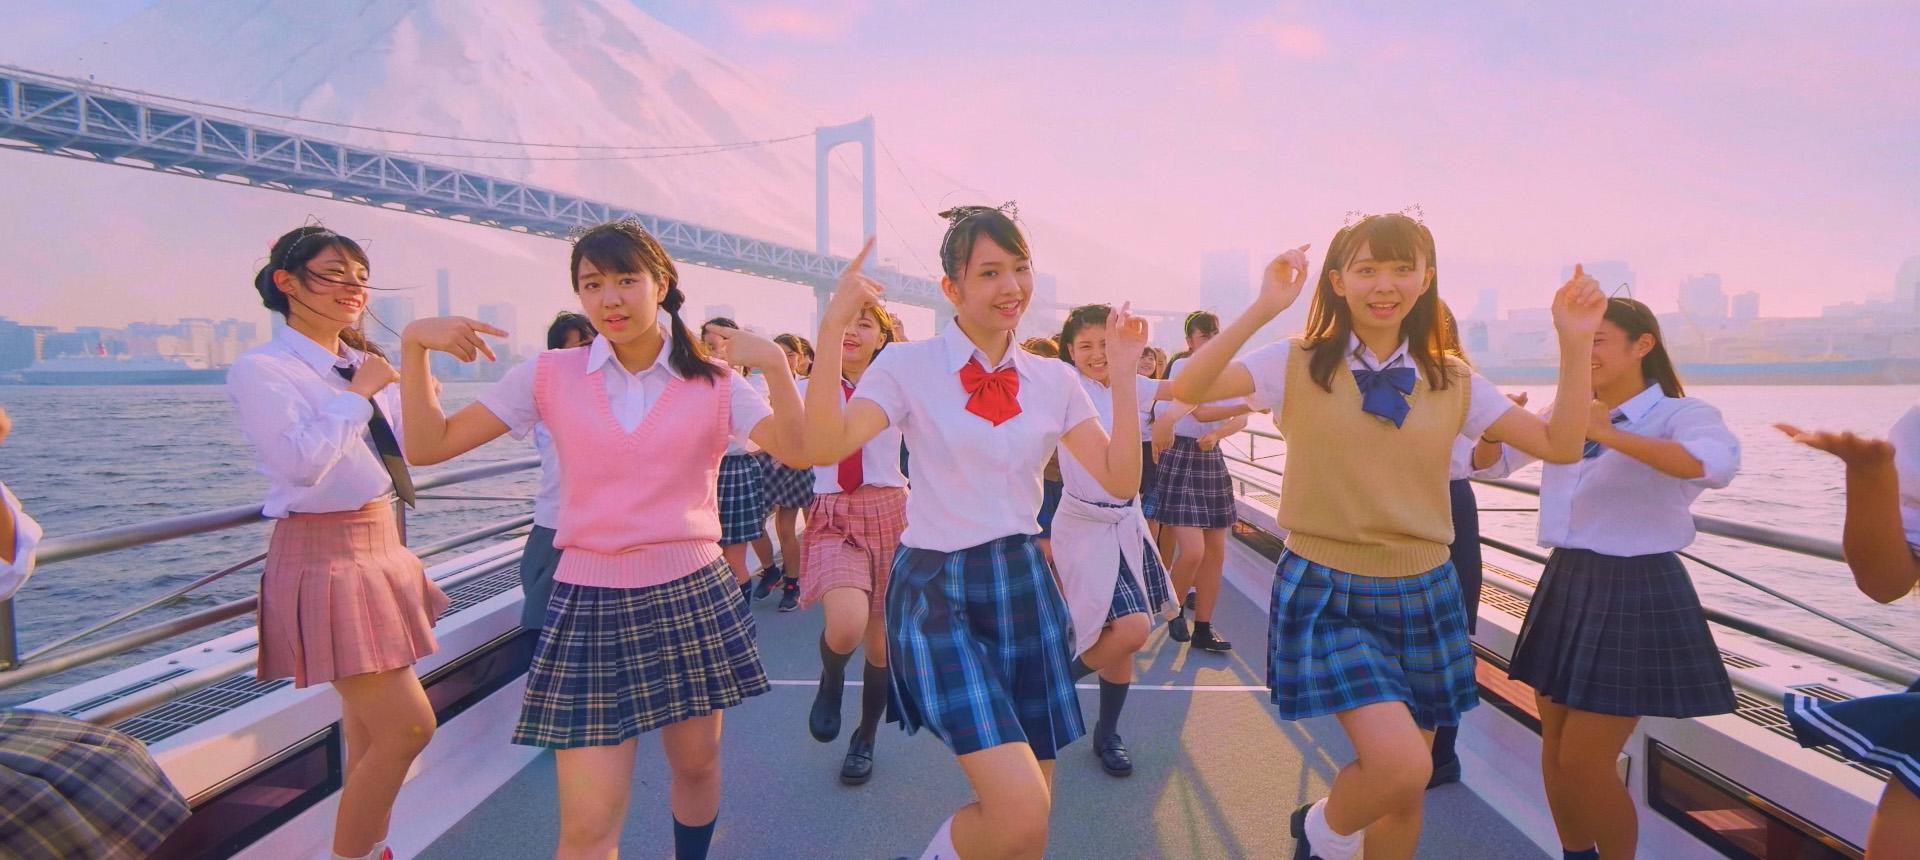 RMMS-Wasuta-Adexe-Nau-Yo-Quiero-Vivir-MV-4